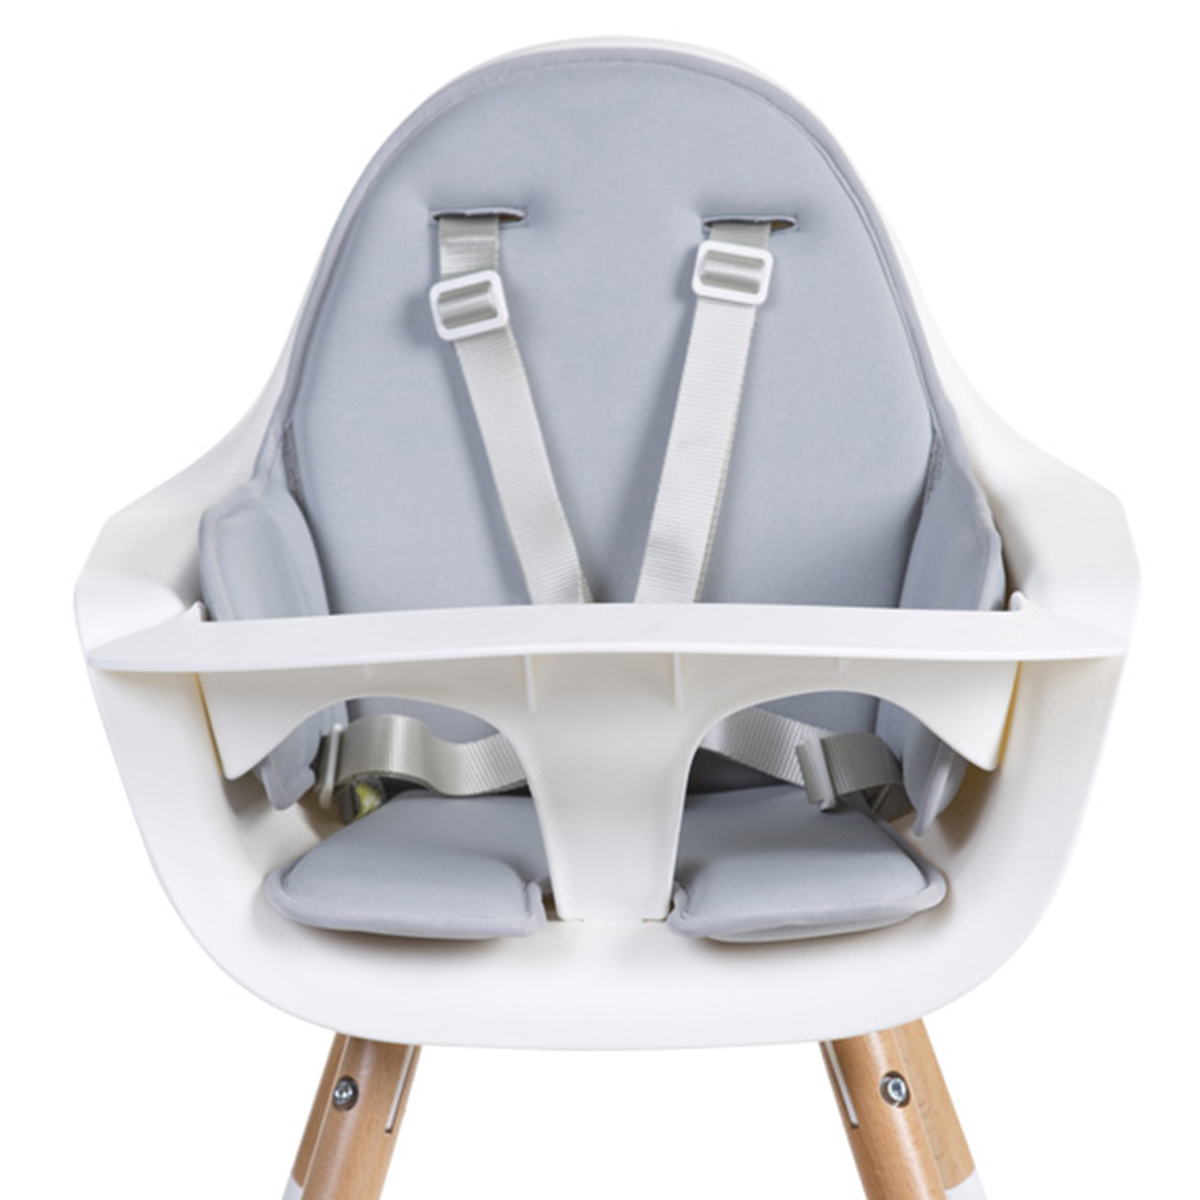 Chaise haute Coussin de Chaise Haute Neoprene - Gris Clair Coussin de Chaise Haute Neoprene - Gris Clair